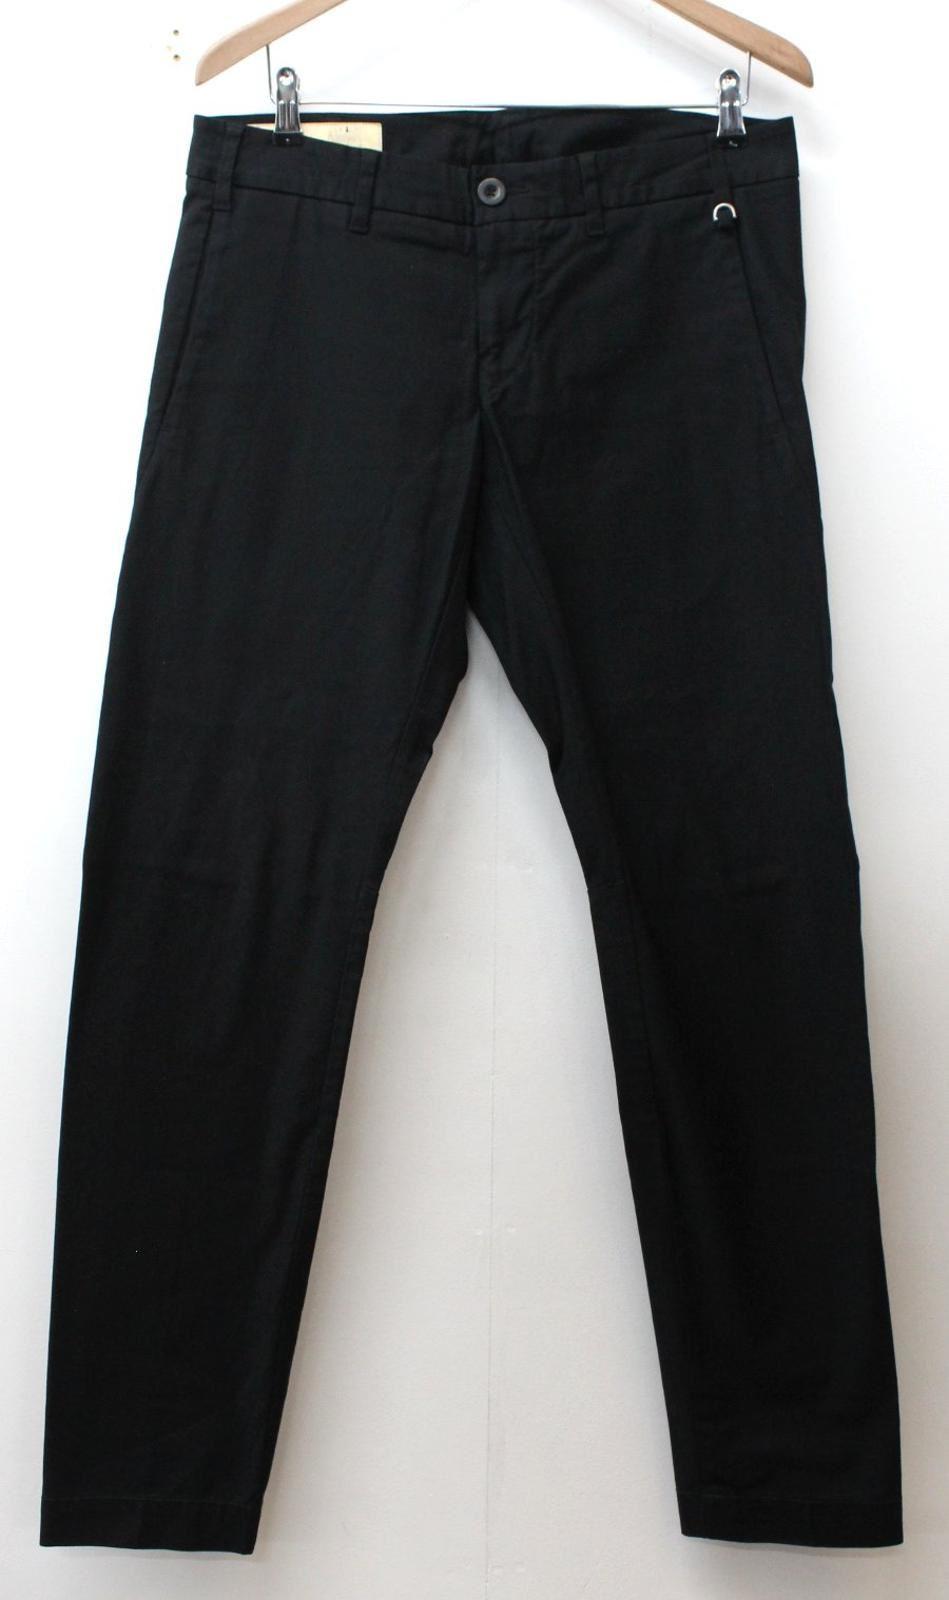 FASHIONISTA Men's schwarz Cotton Blend Flat Front Style Trousers Größe W34 L33